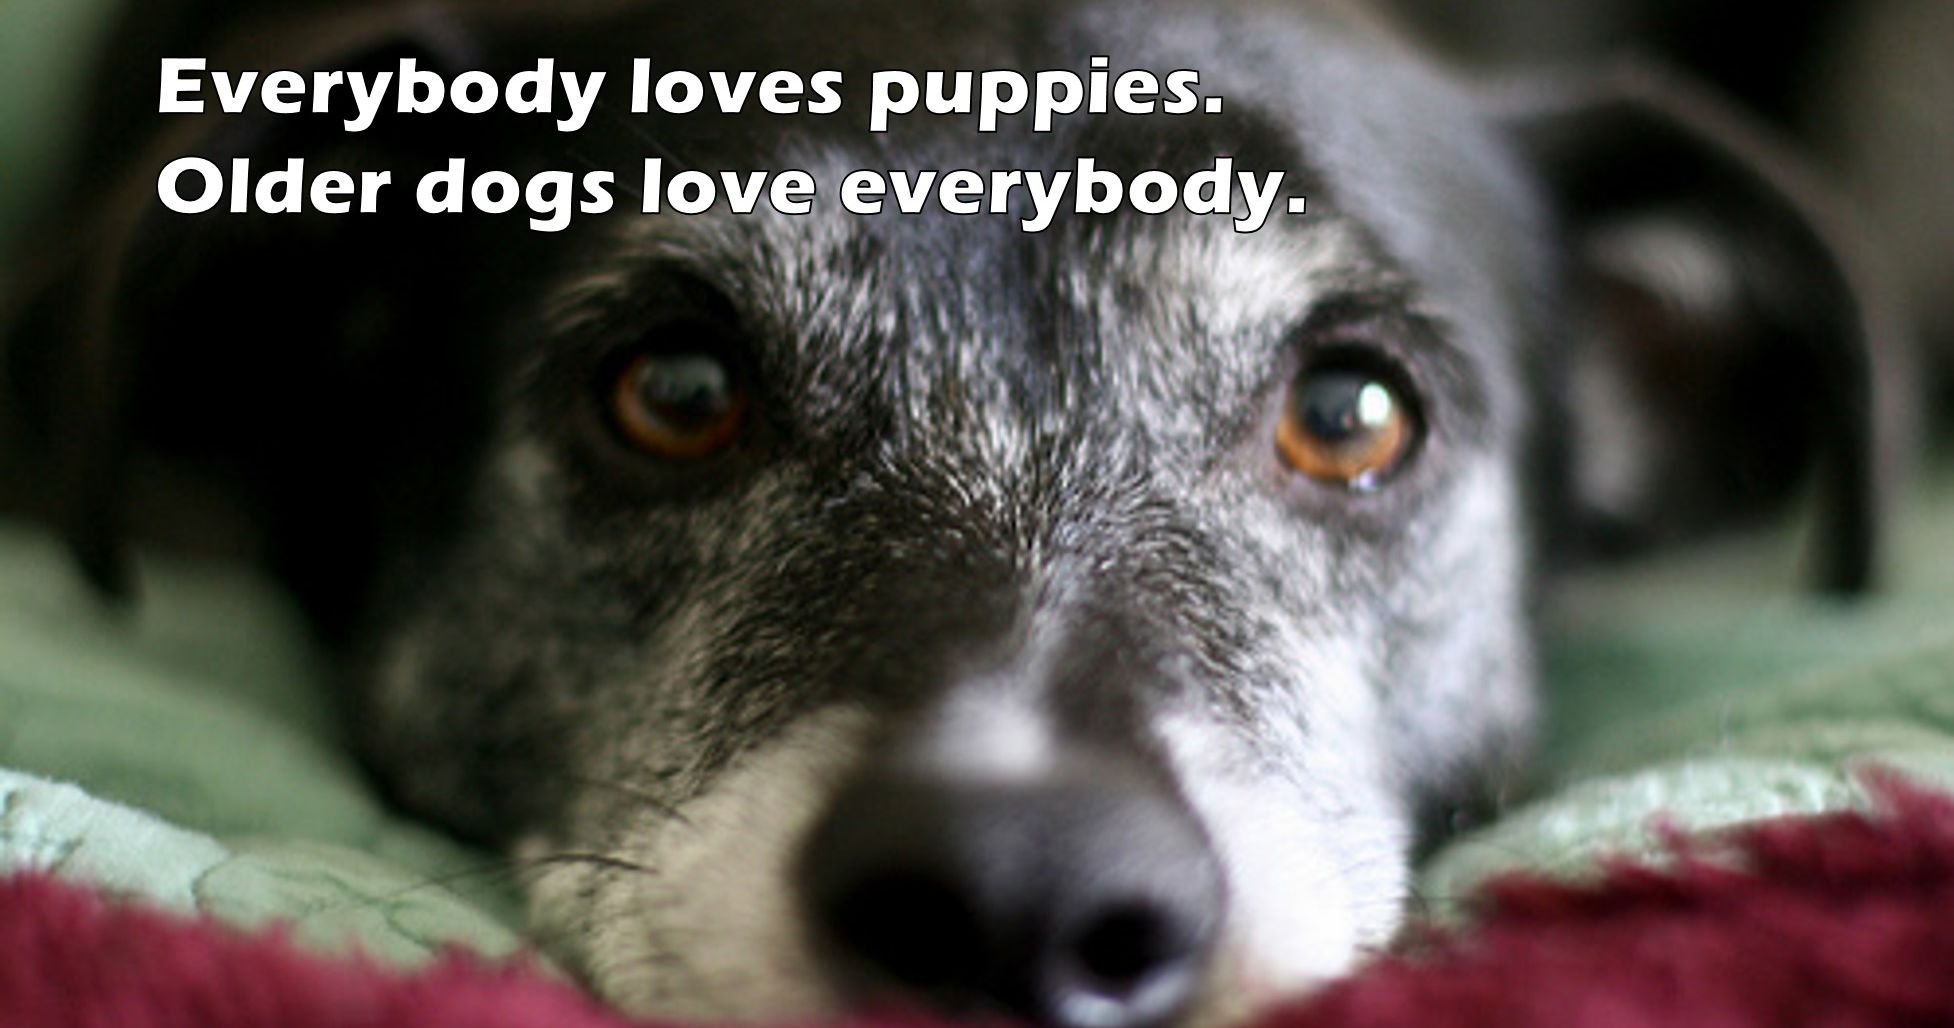 adopt-older-dogs.jpg